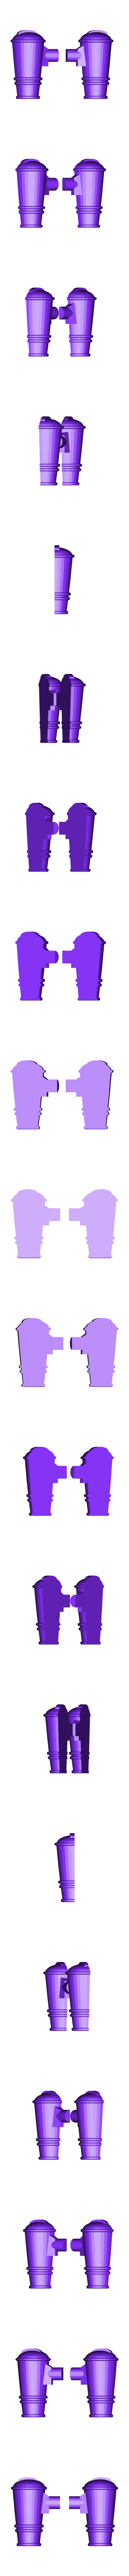 Split_Shoulder_Cannon.stl Download free STL file Modular Mech SteamPunk • Design to 3D print, mrhers2